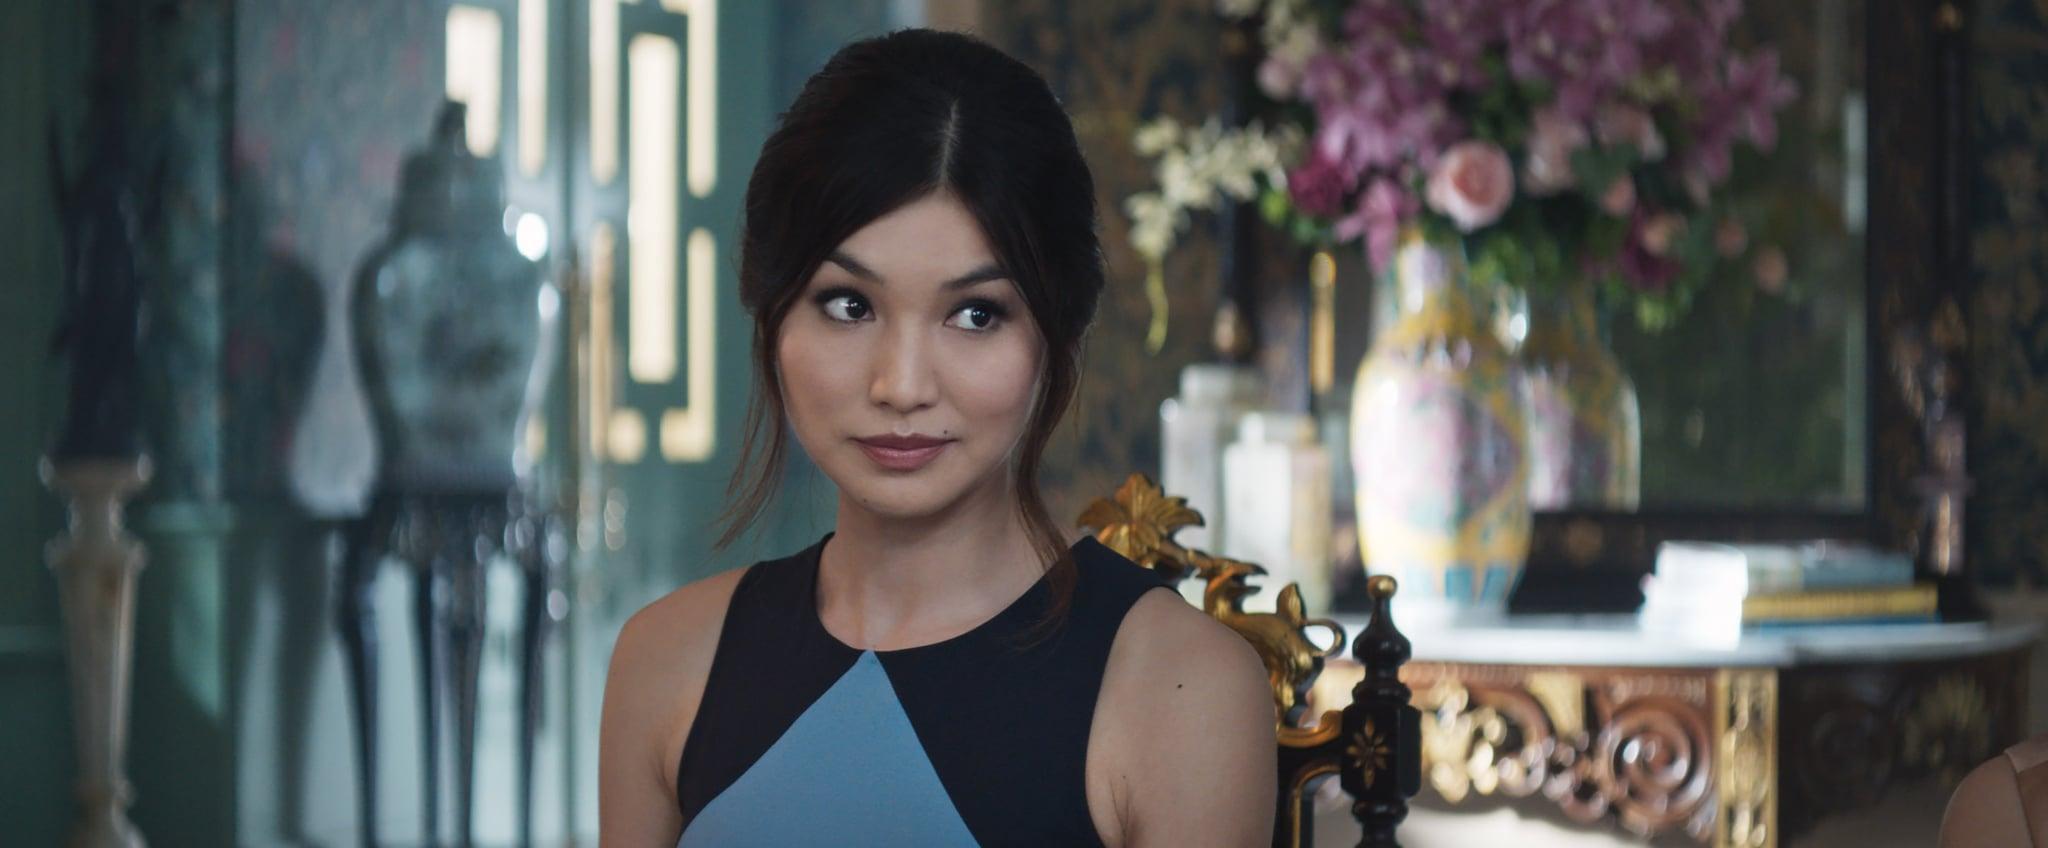 Au sexy beauty asian, paulina rubio peeing nackade